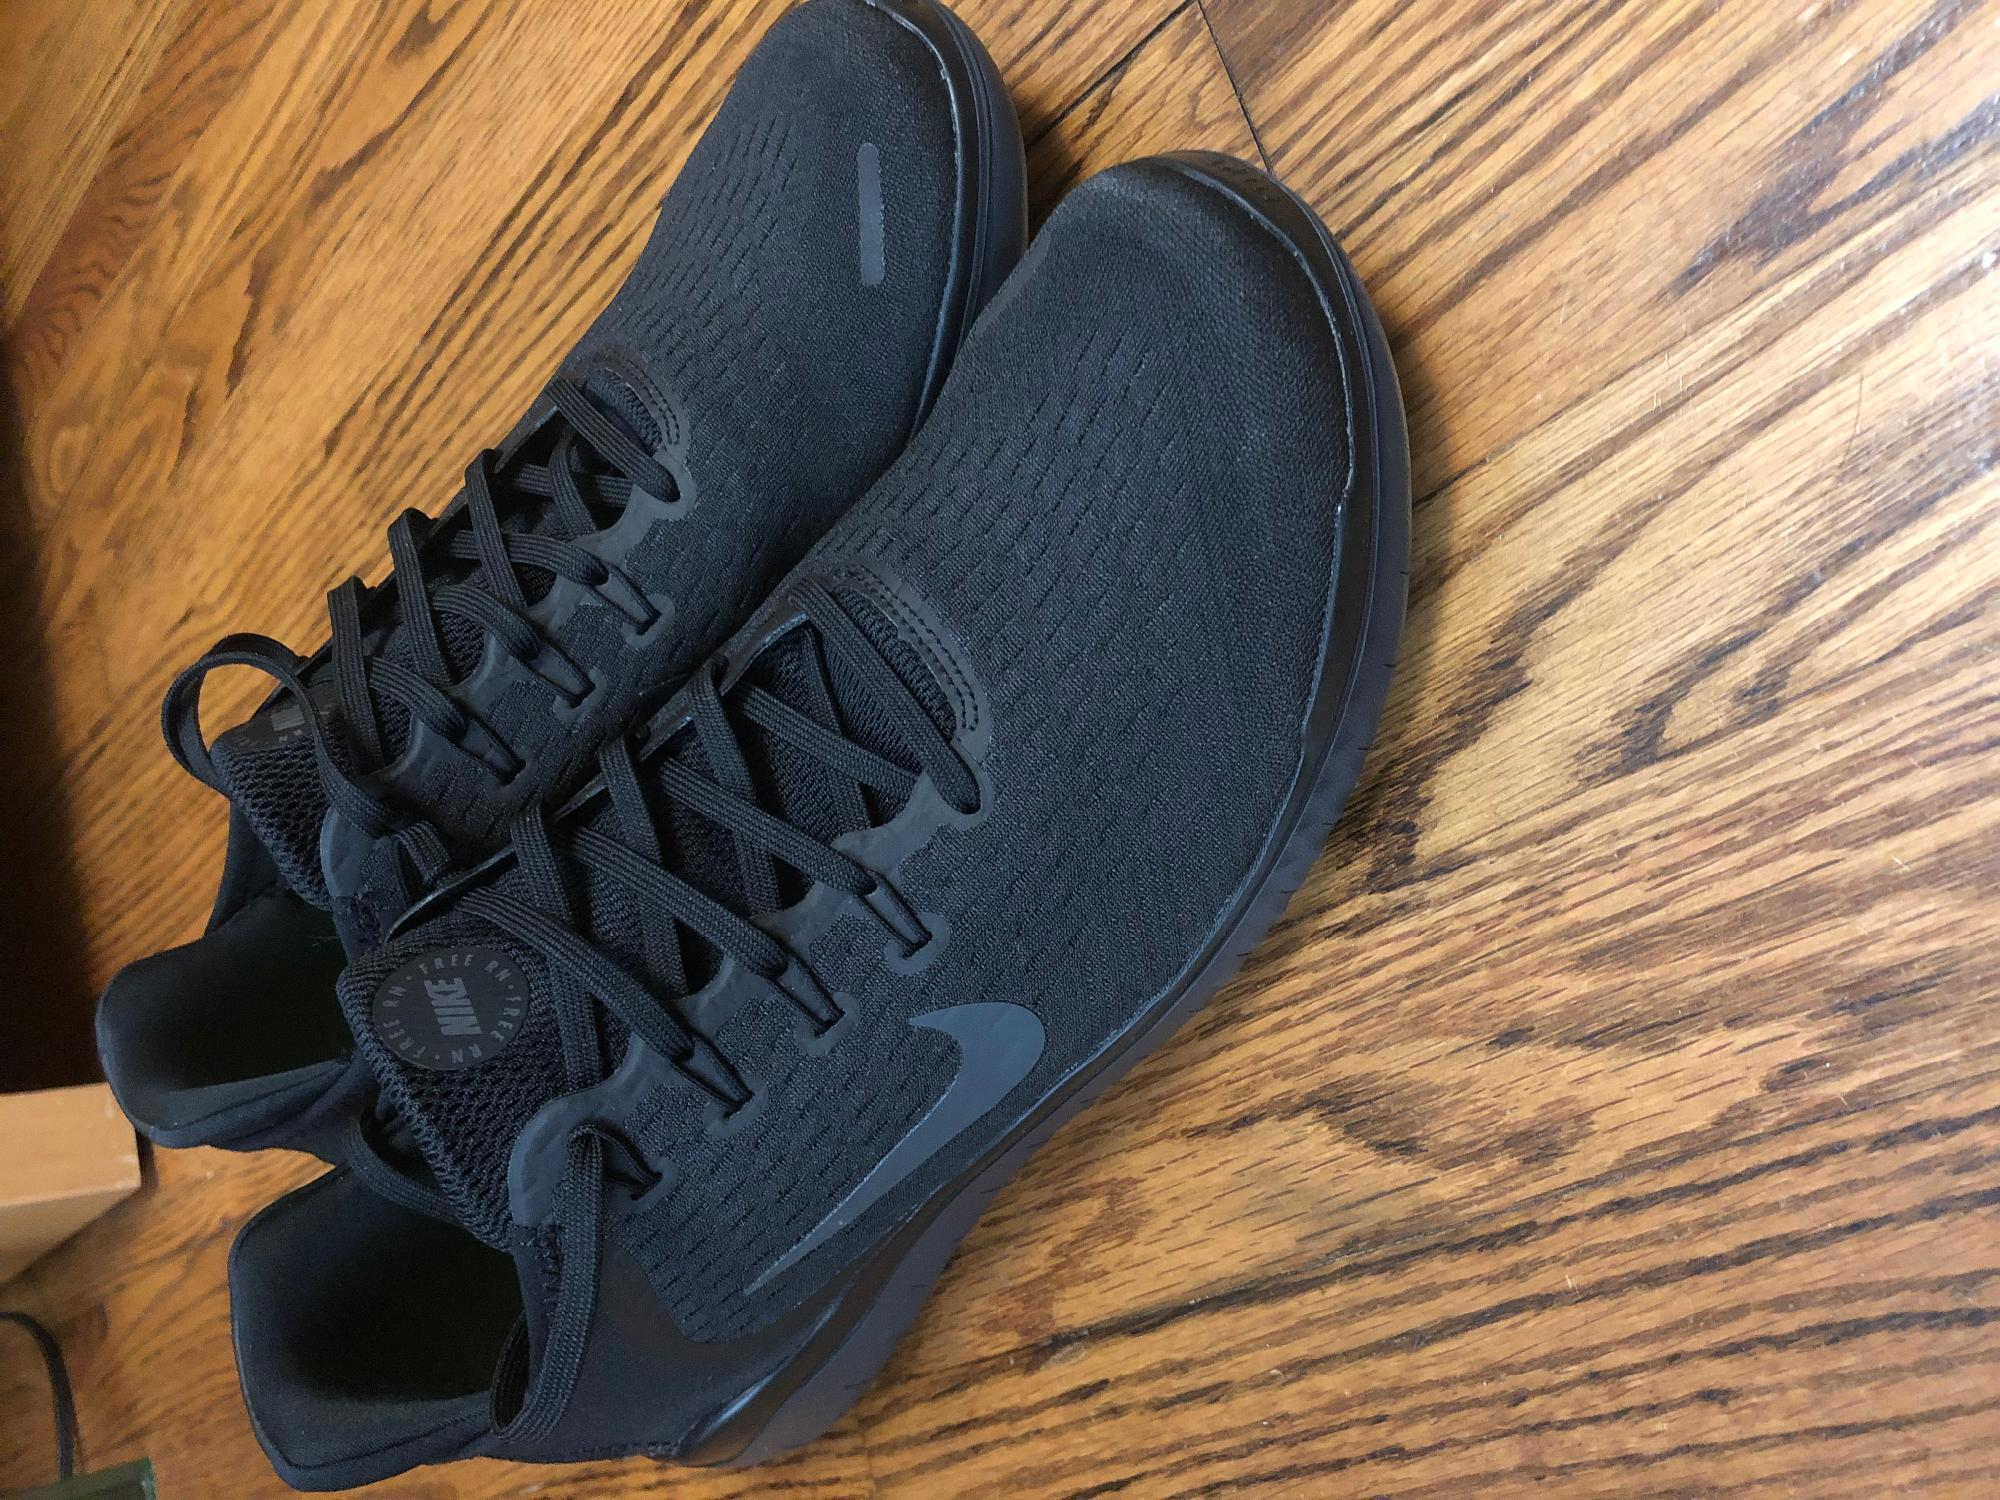 4689e2aa3b3ae Nike Free RN 2018 at Zappos.com